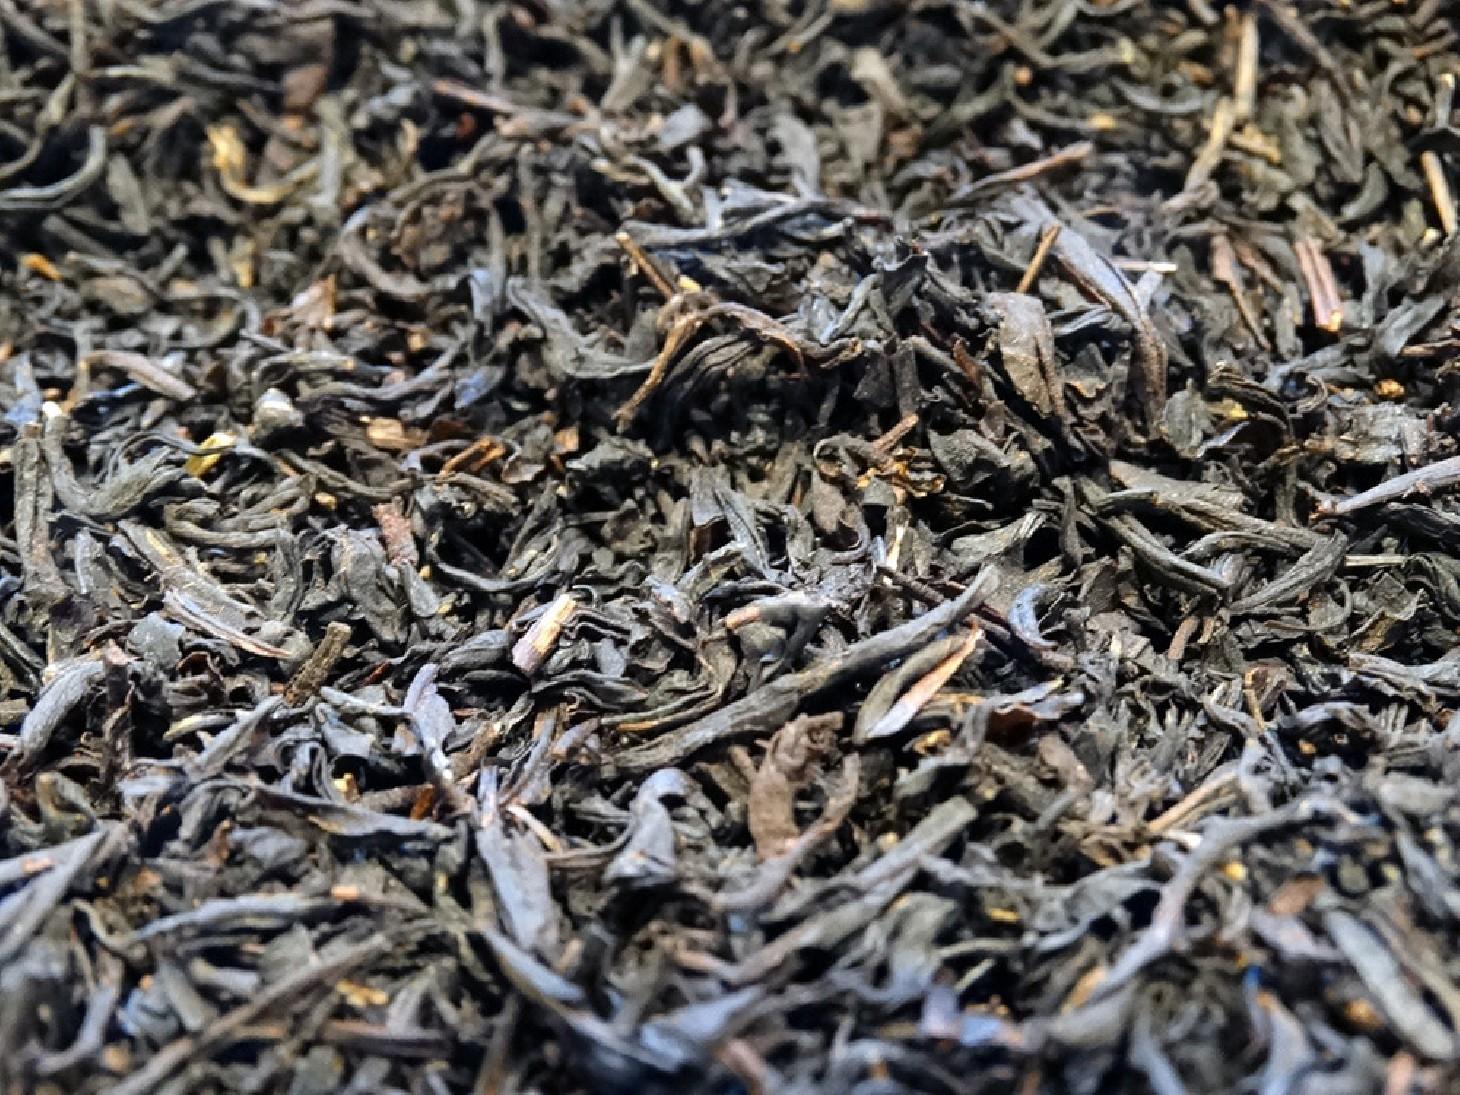 flavored black tea, old-fashioned licorice.